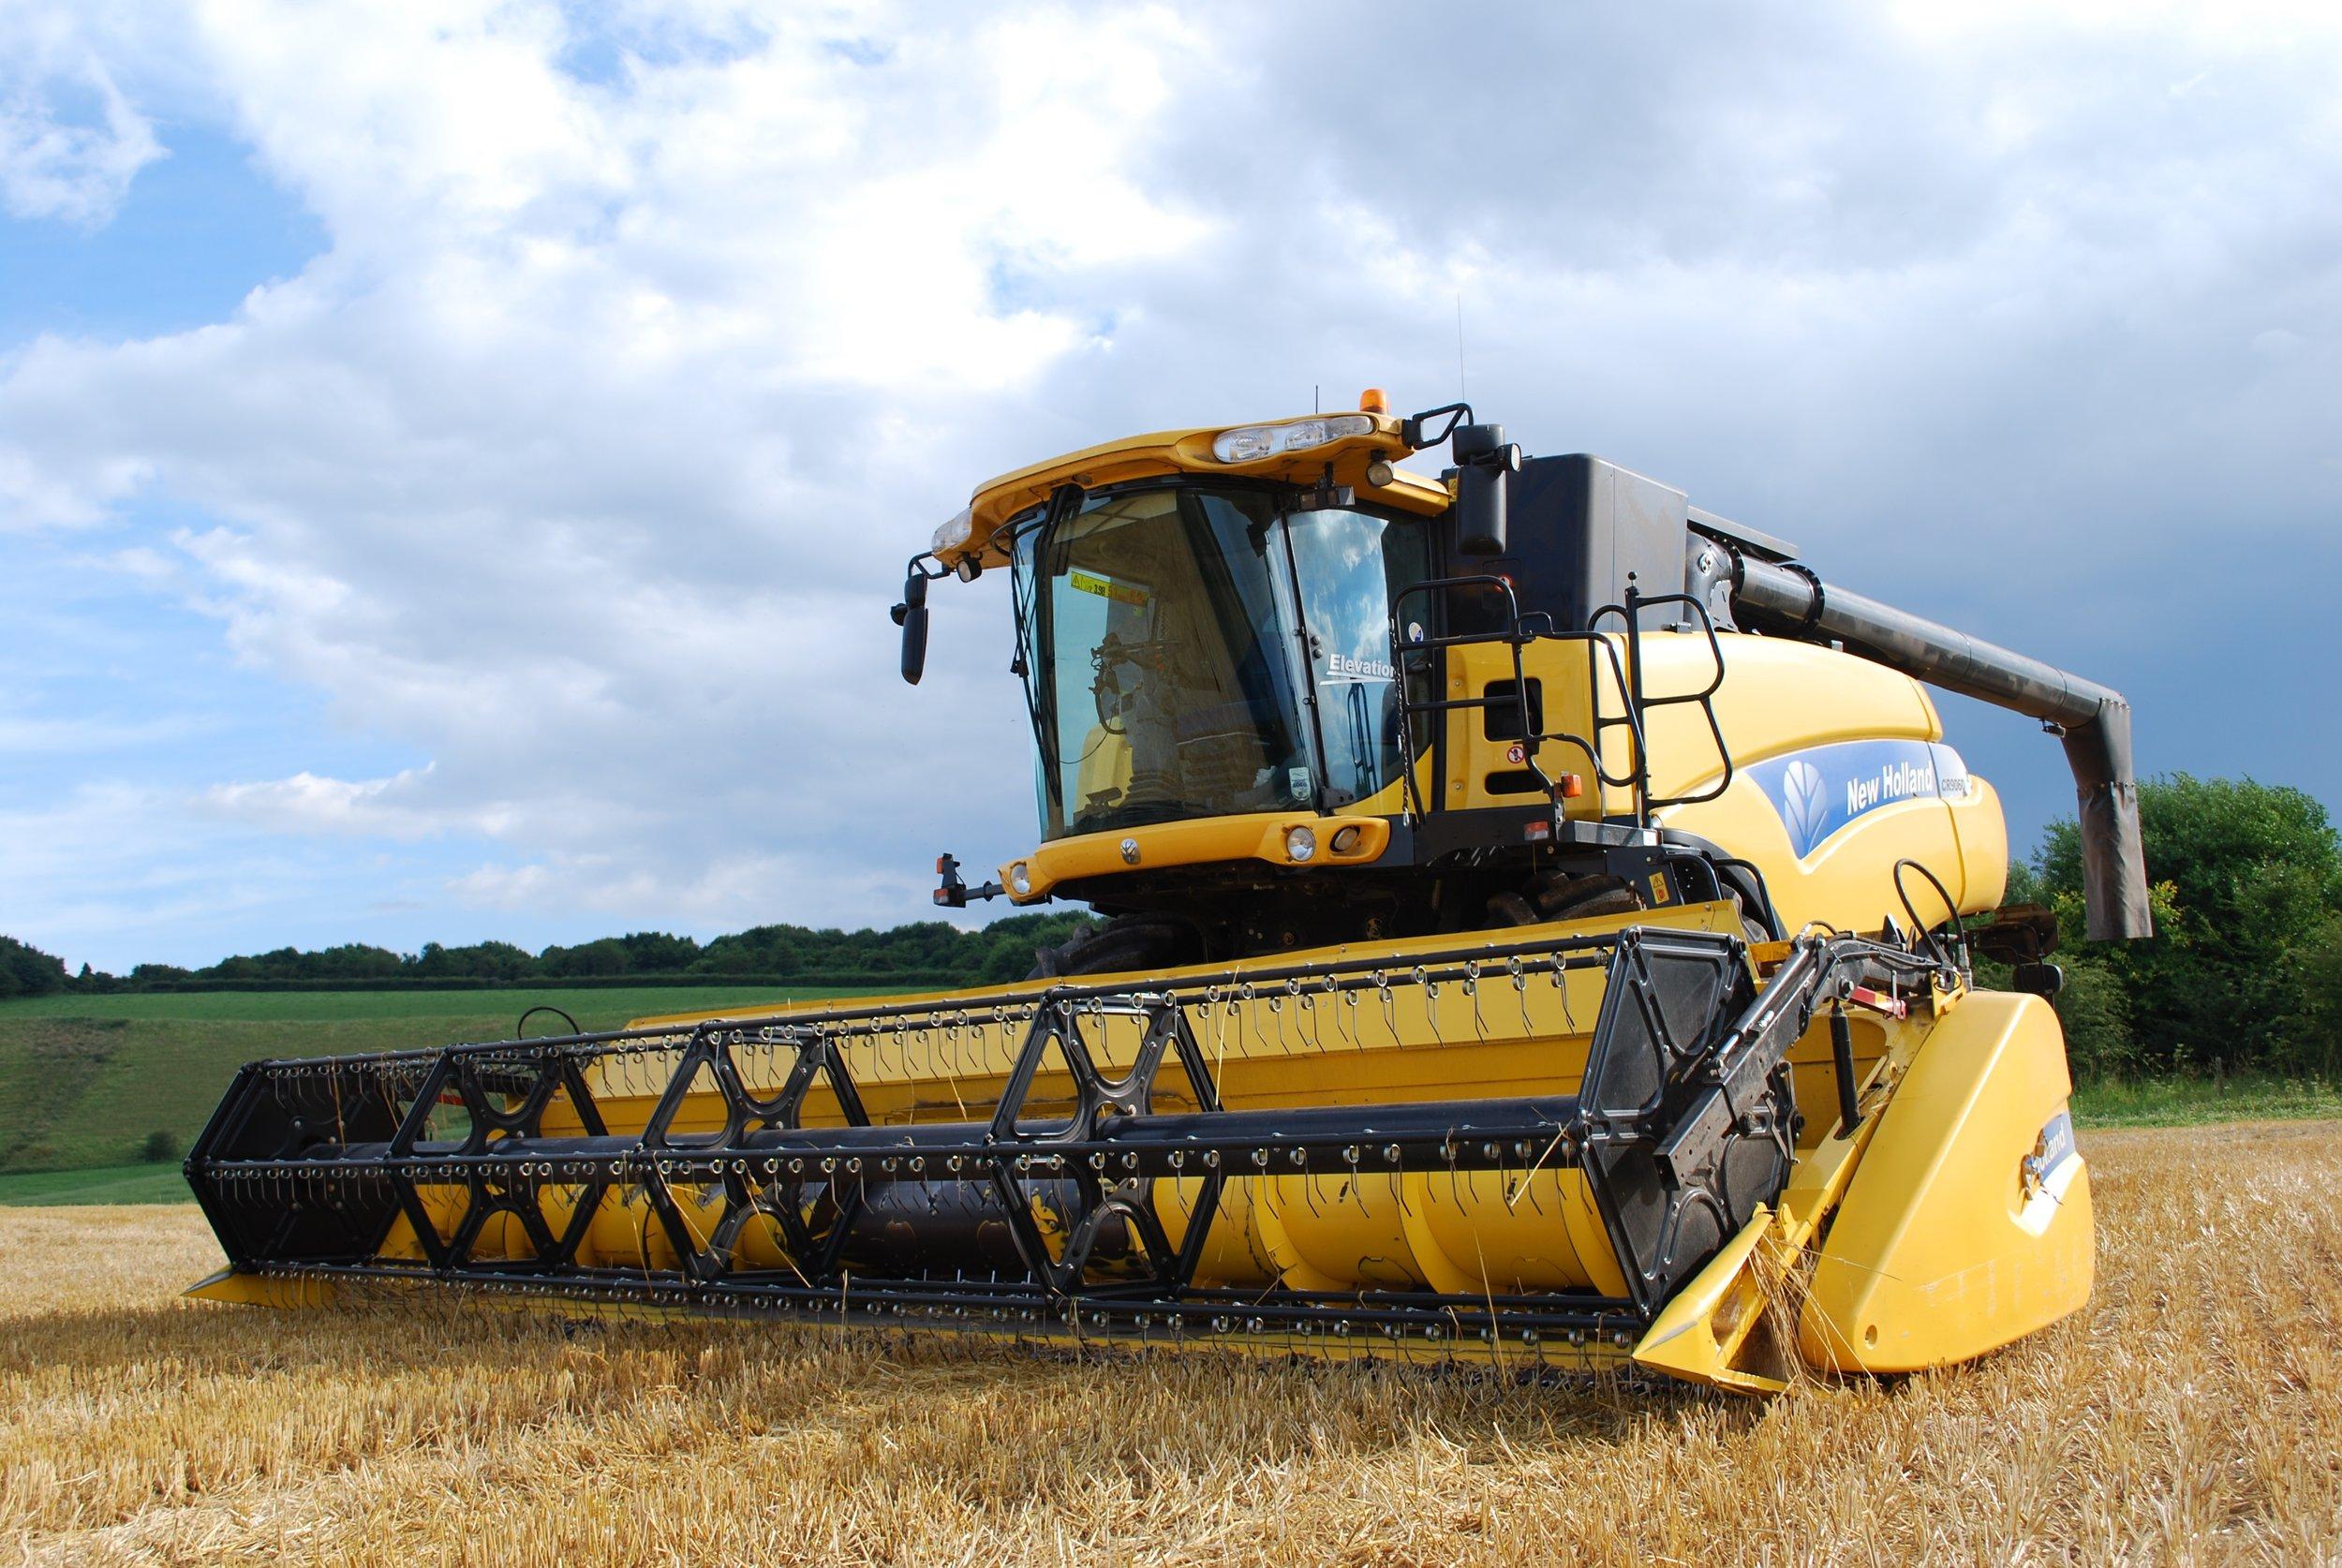 field-farm-wheat-grain-land-asphalt-744321-pxhere.com.jpg